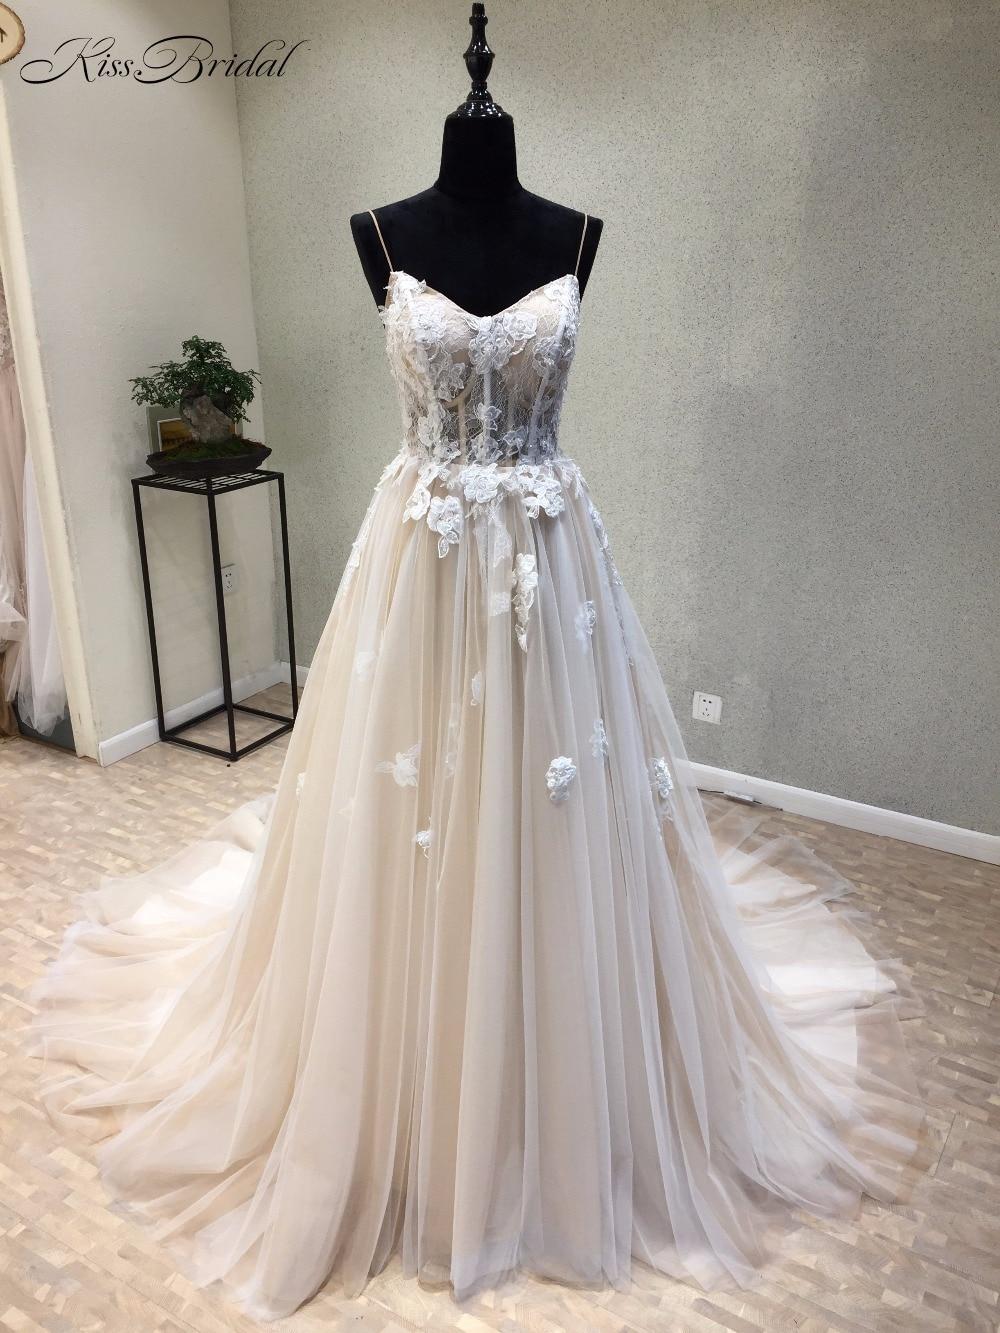 Amazing New Long Wedding Dress 2018 Sweetheart Spaghetti Strap - Bröllopsklänningar